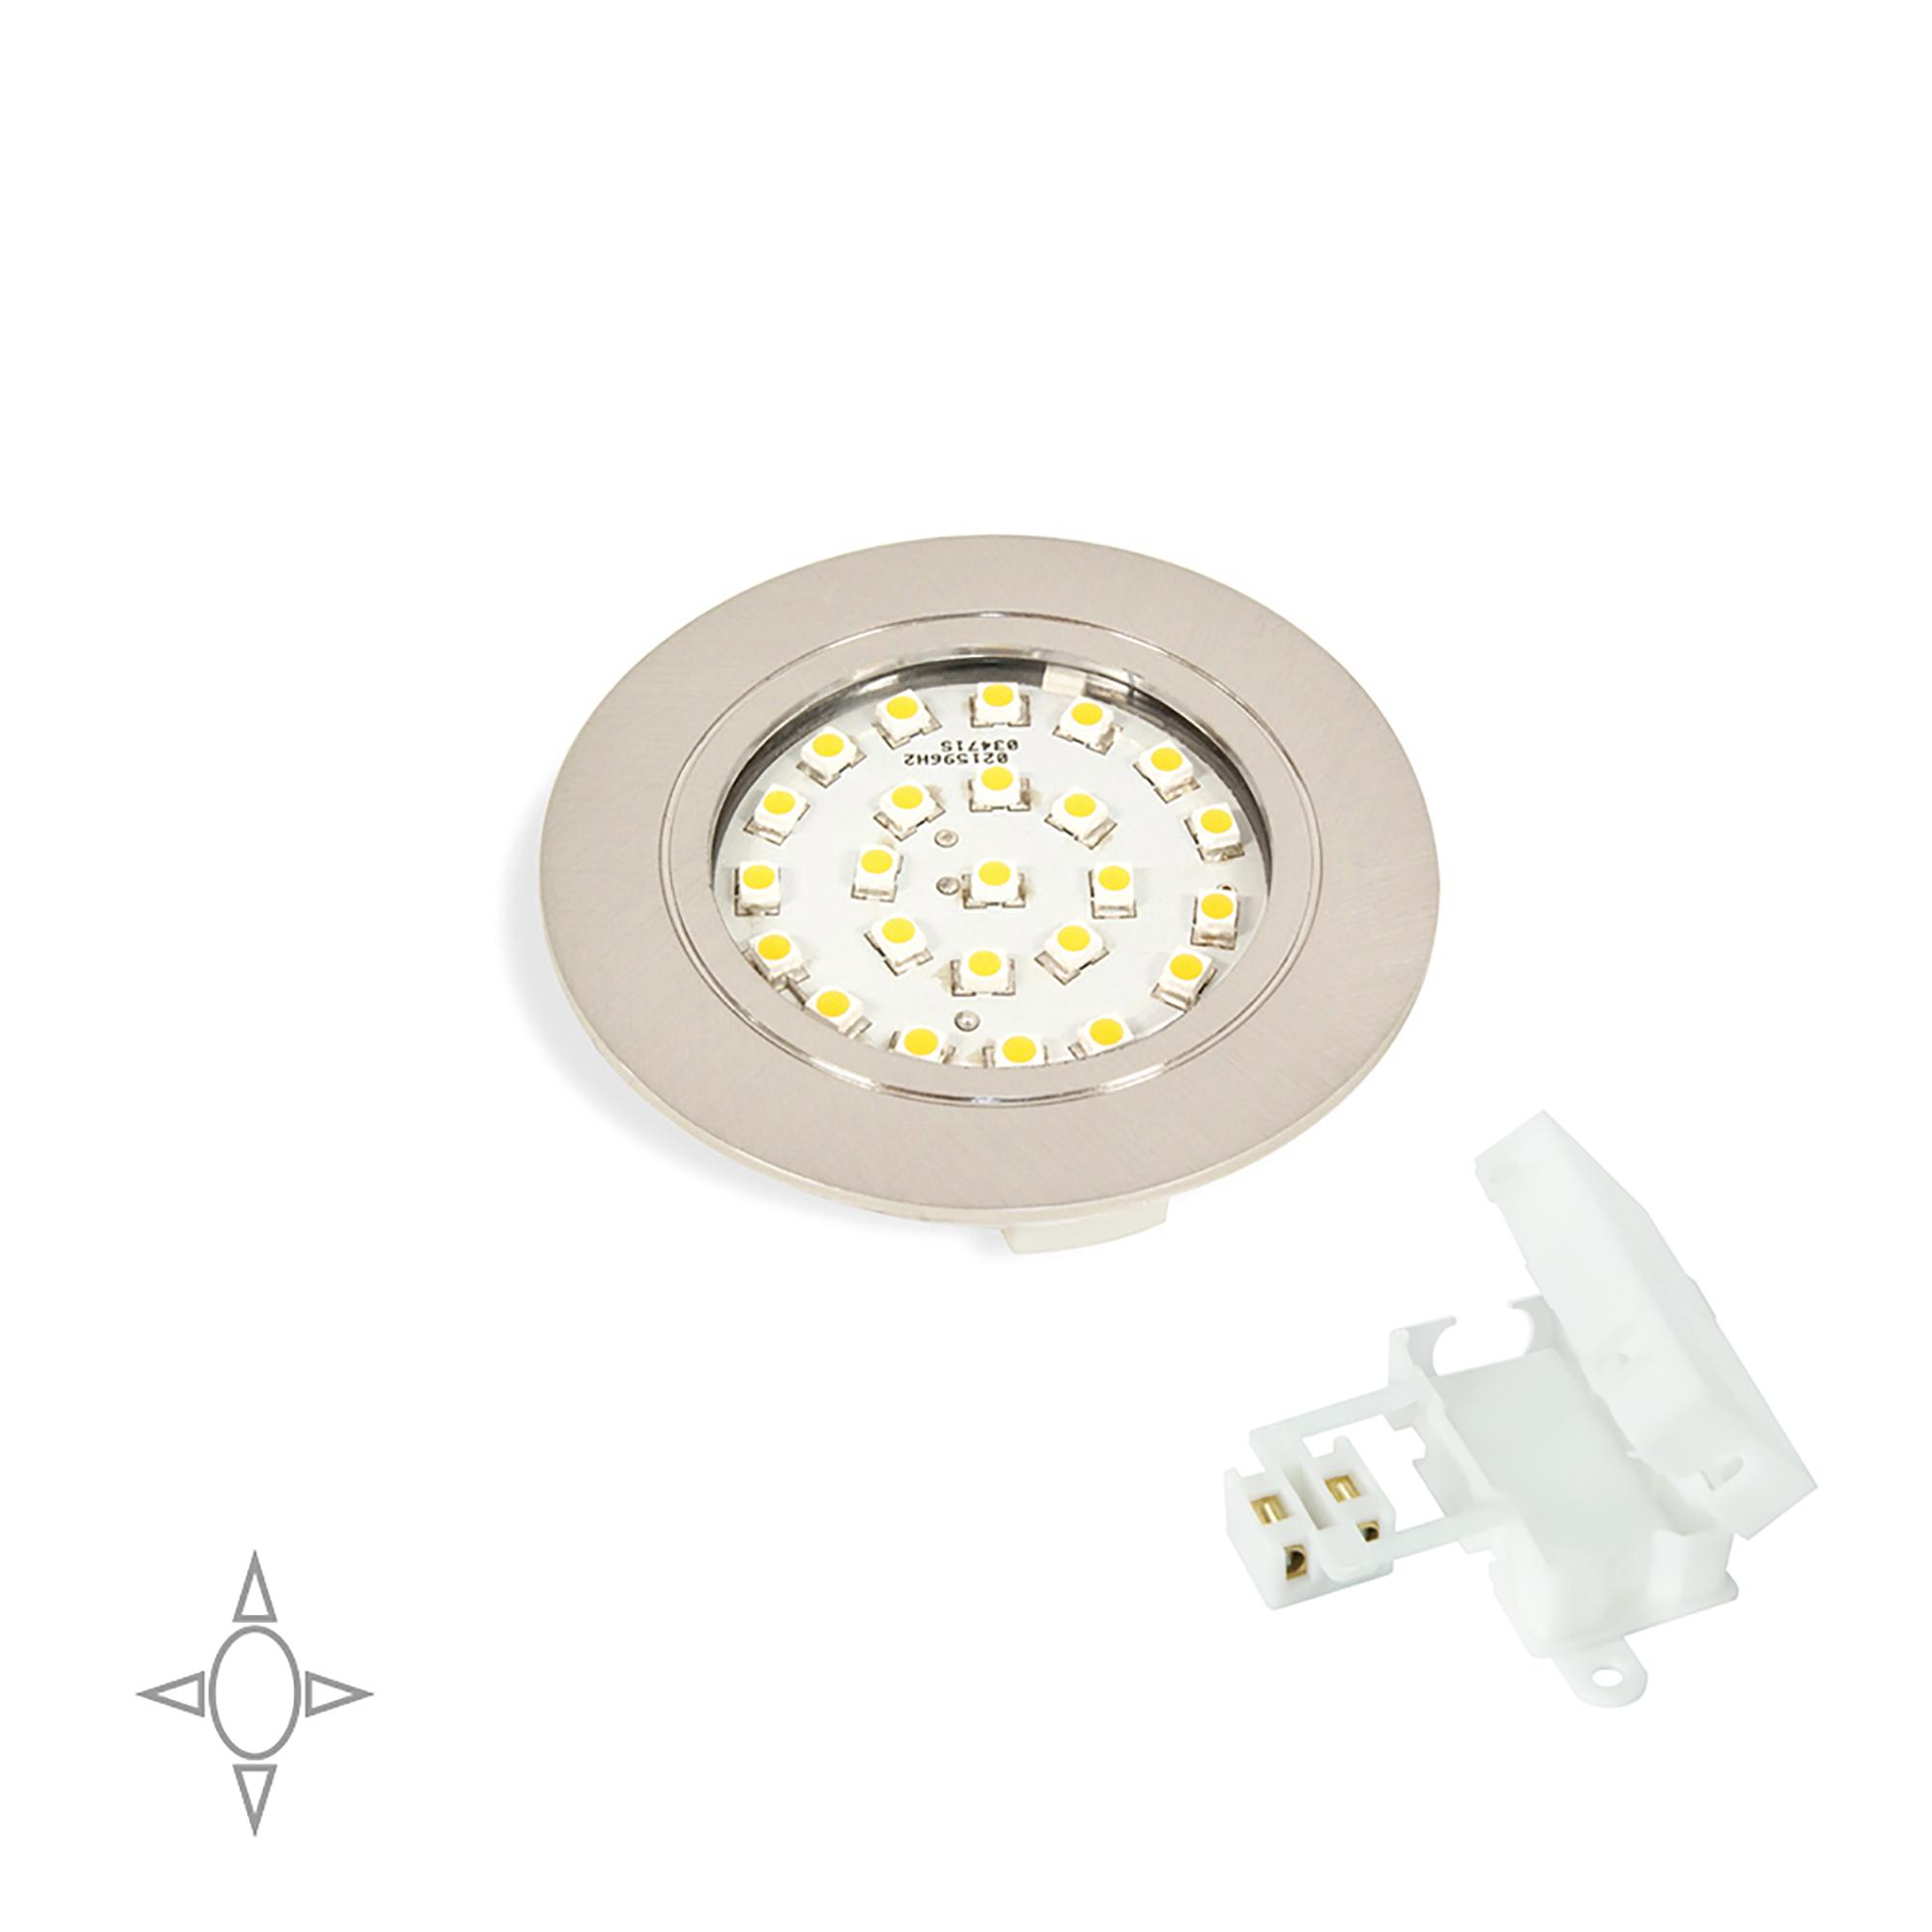 Emuca Faretto LED, D. 65 mm, a incasso, Luce bianca naturale, Plastica, Nichel satinato